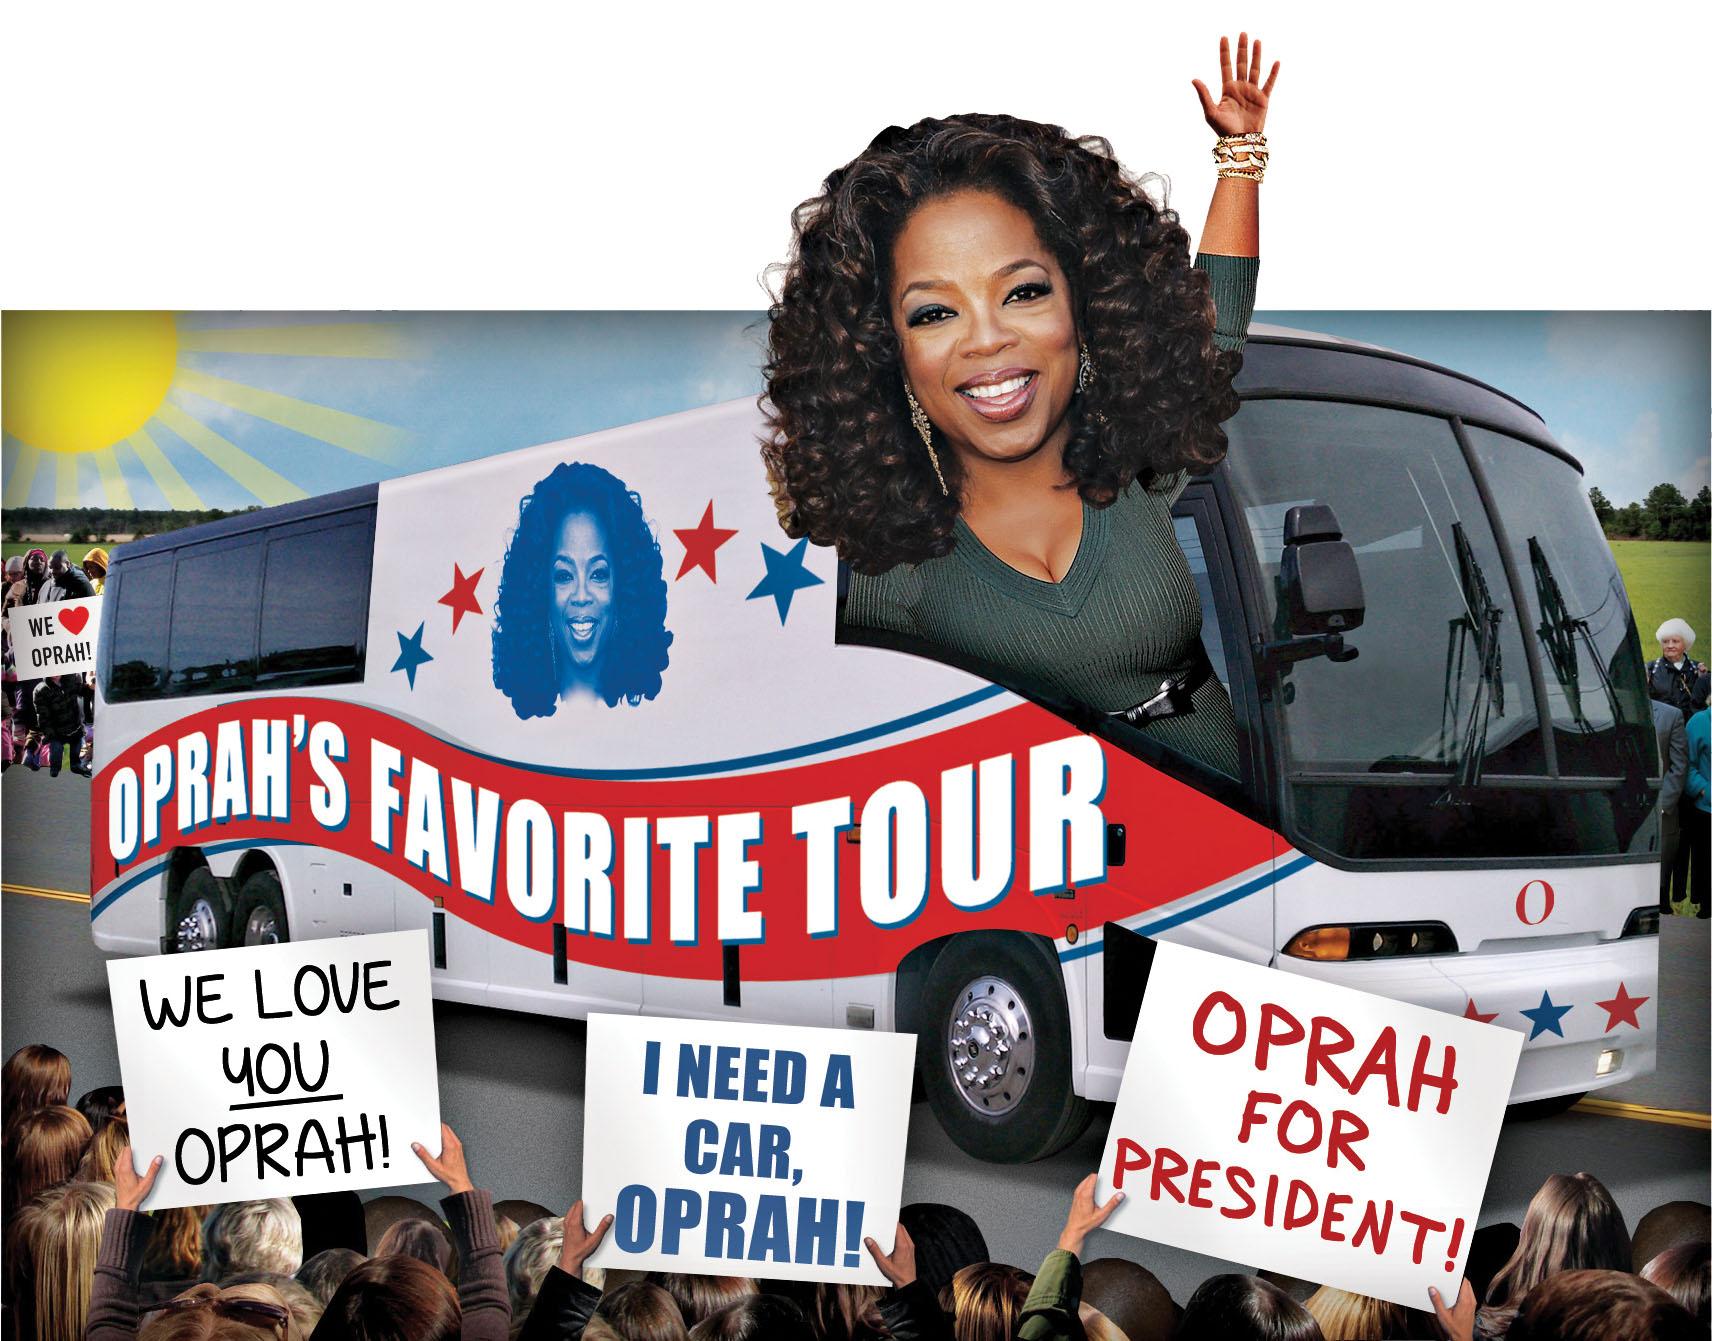 Oprah Illustration - H 2014